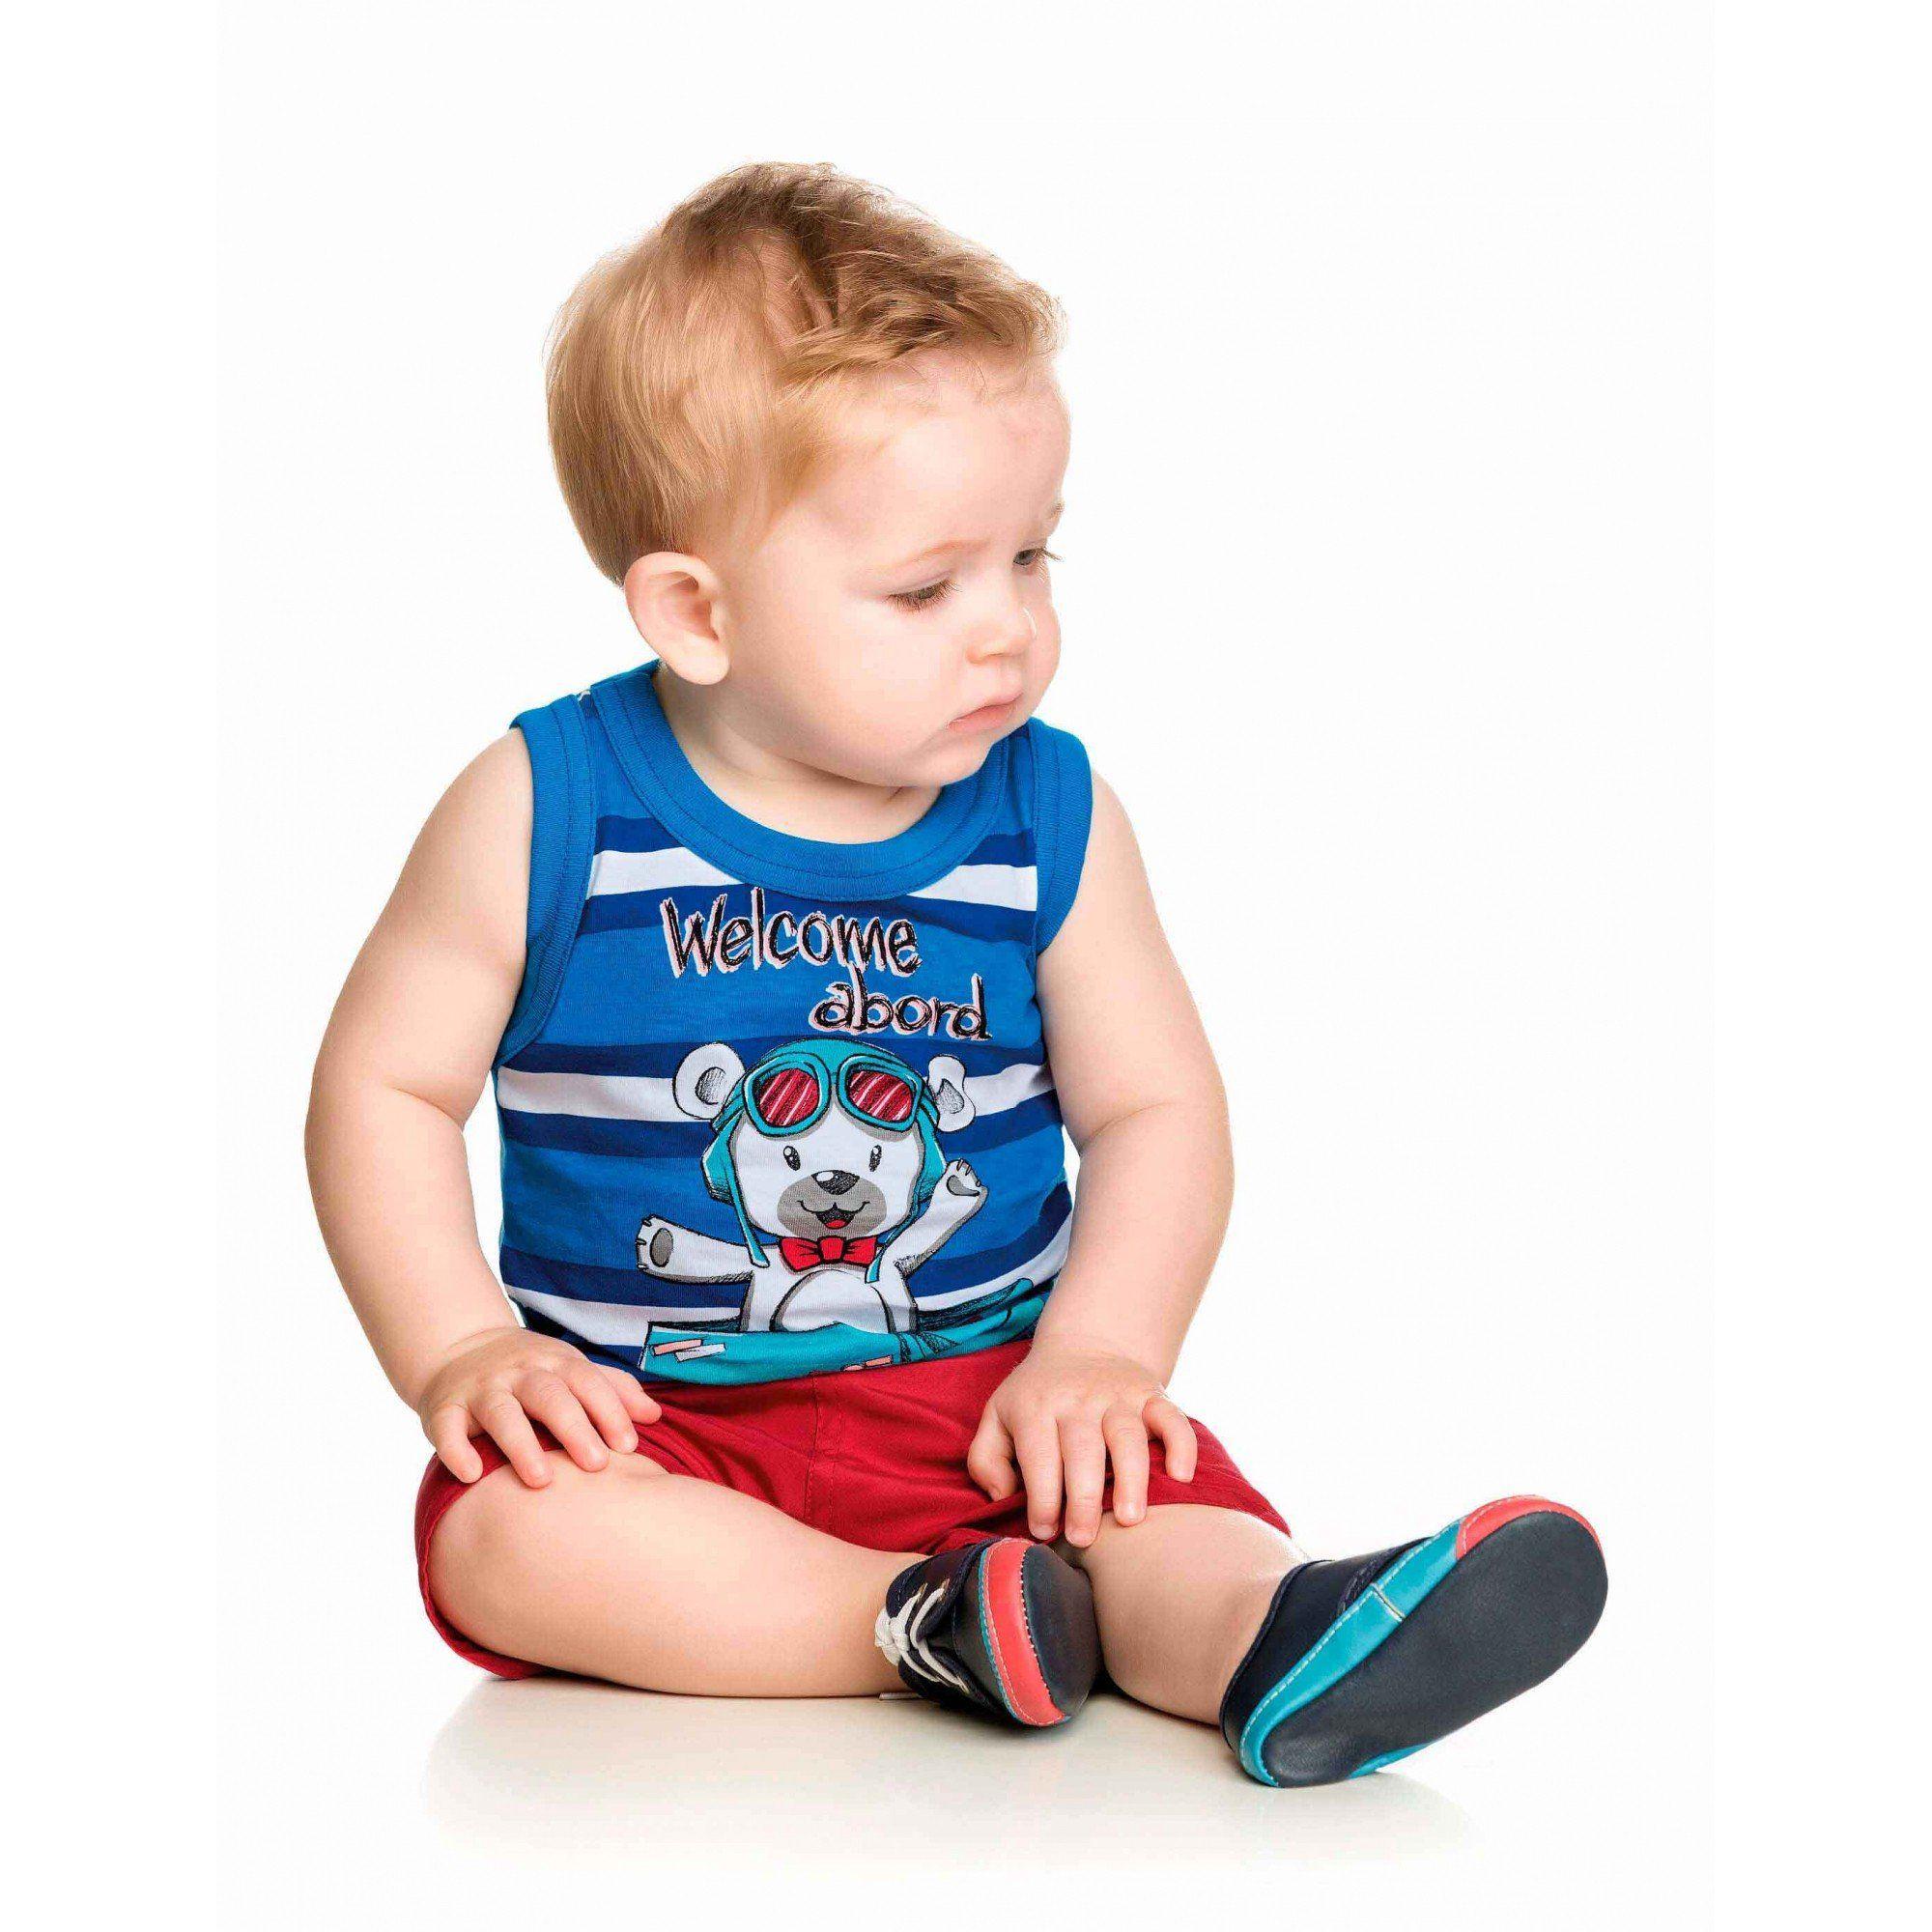 Conjunto Infantil Masculino Azul Royal Welcome Abord Elian